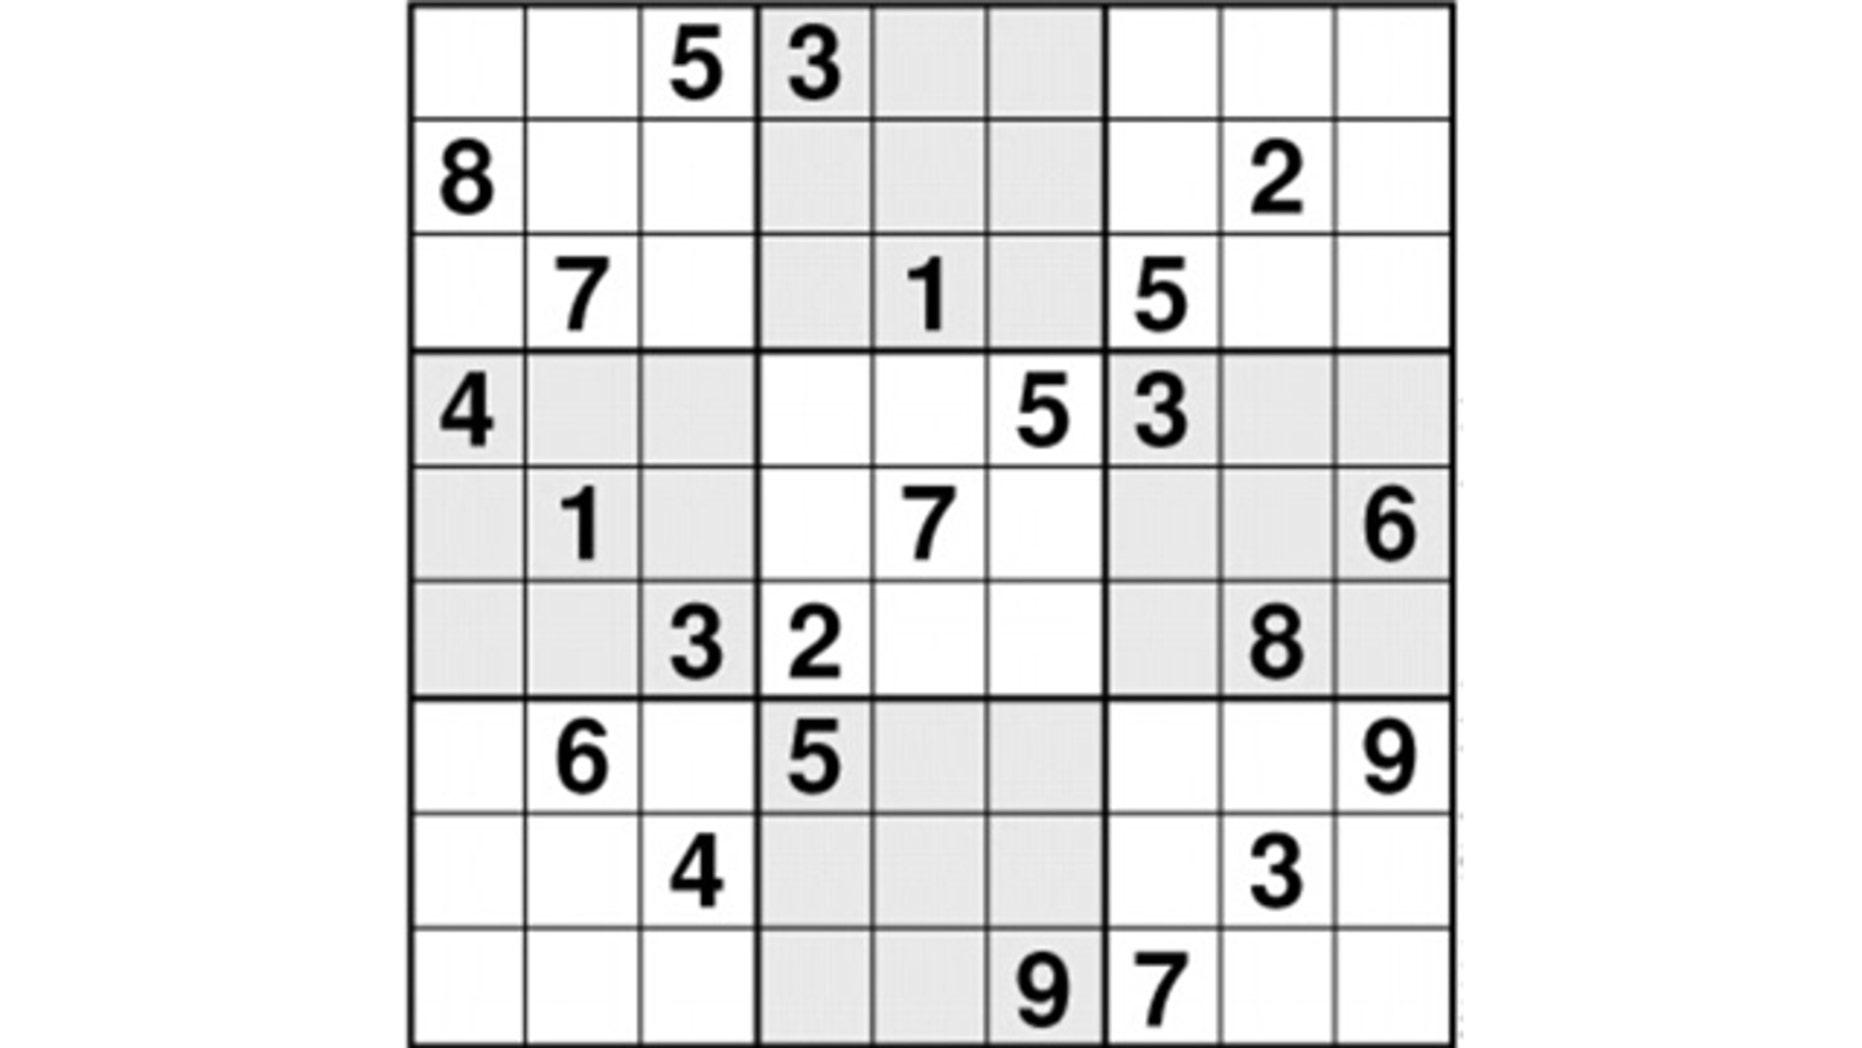 Can You Crack the World's Toughest Sudoku? | Fox News